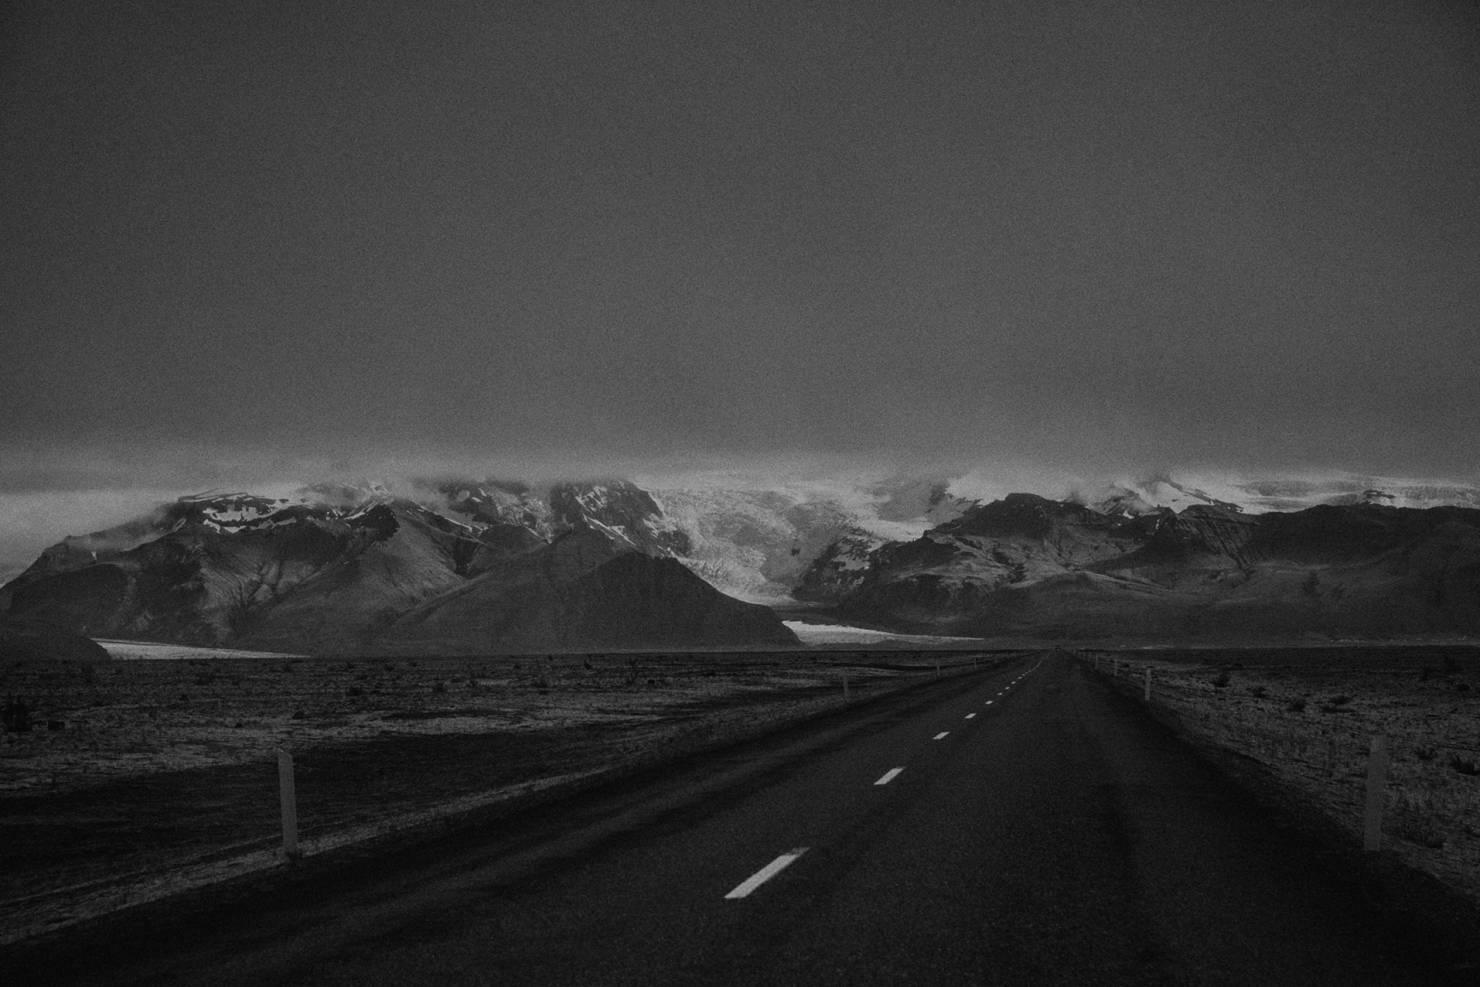 patrick_schuttler_landscape_iceland_003-710d741833ad72dbf928780e8653dfa4